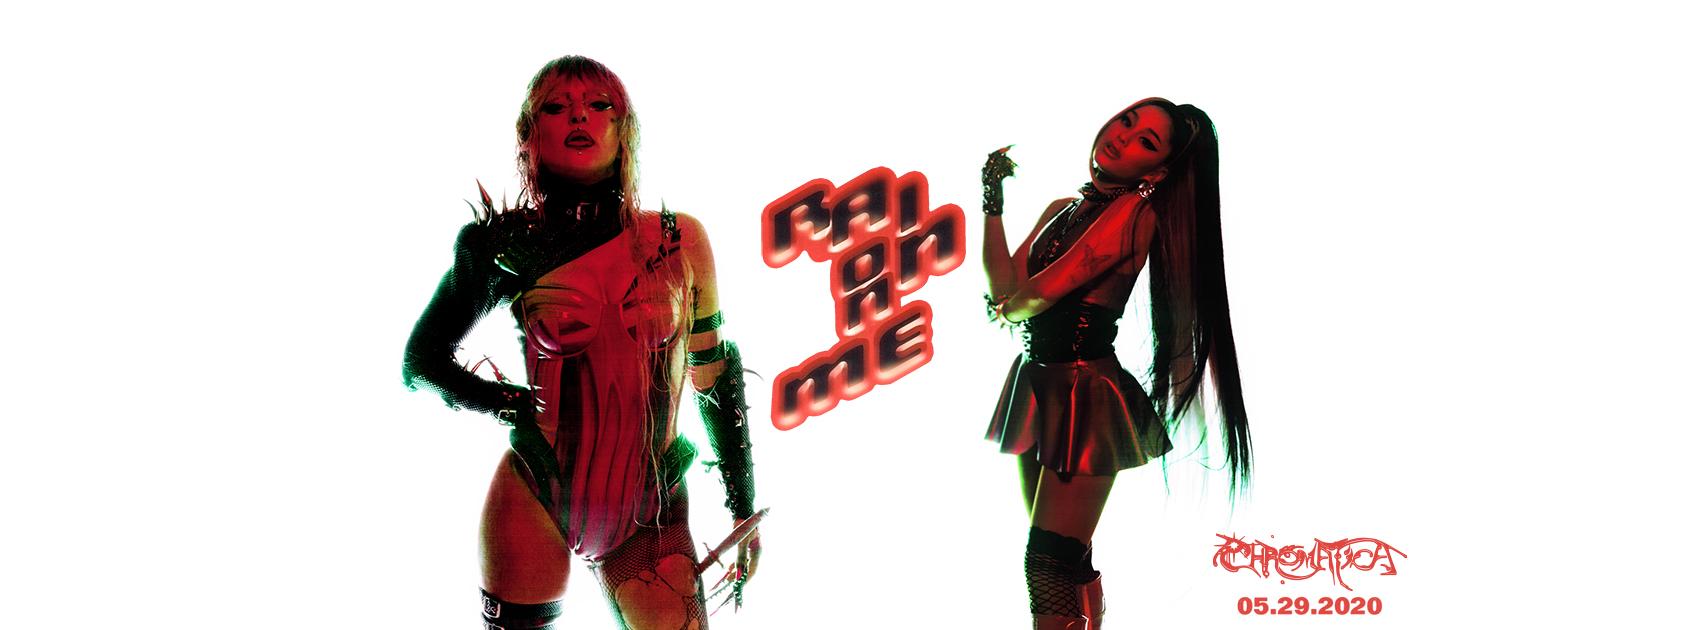 Lady Gaga - Ariana Grande - Rain on me - Chromatica